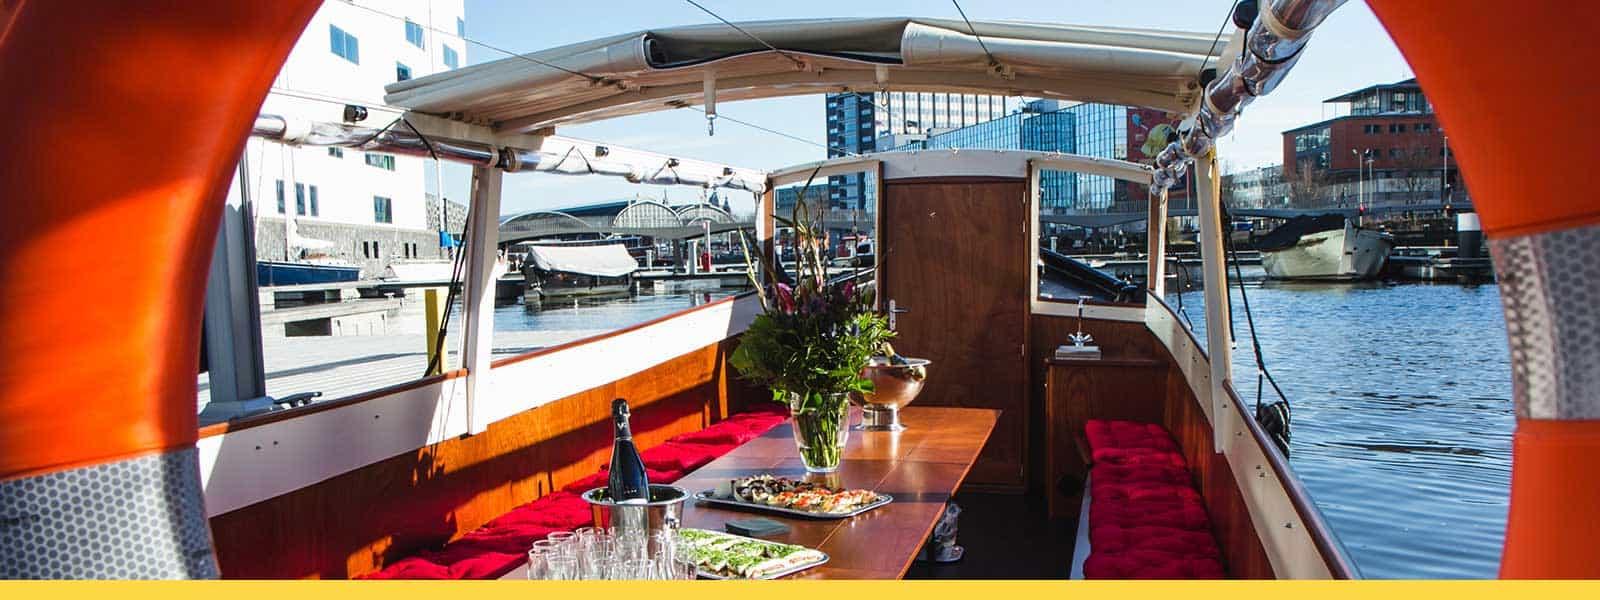 Geliefde Tapasboot Amsterdam   Borreltocht met Shared Tapas #TN57